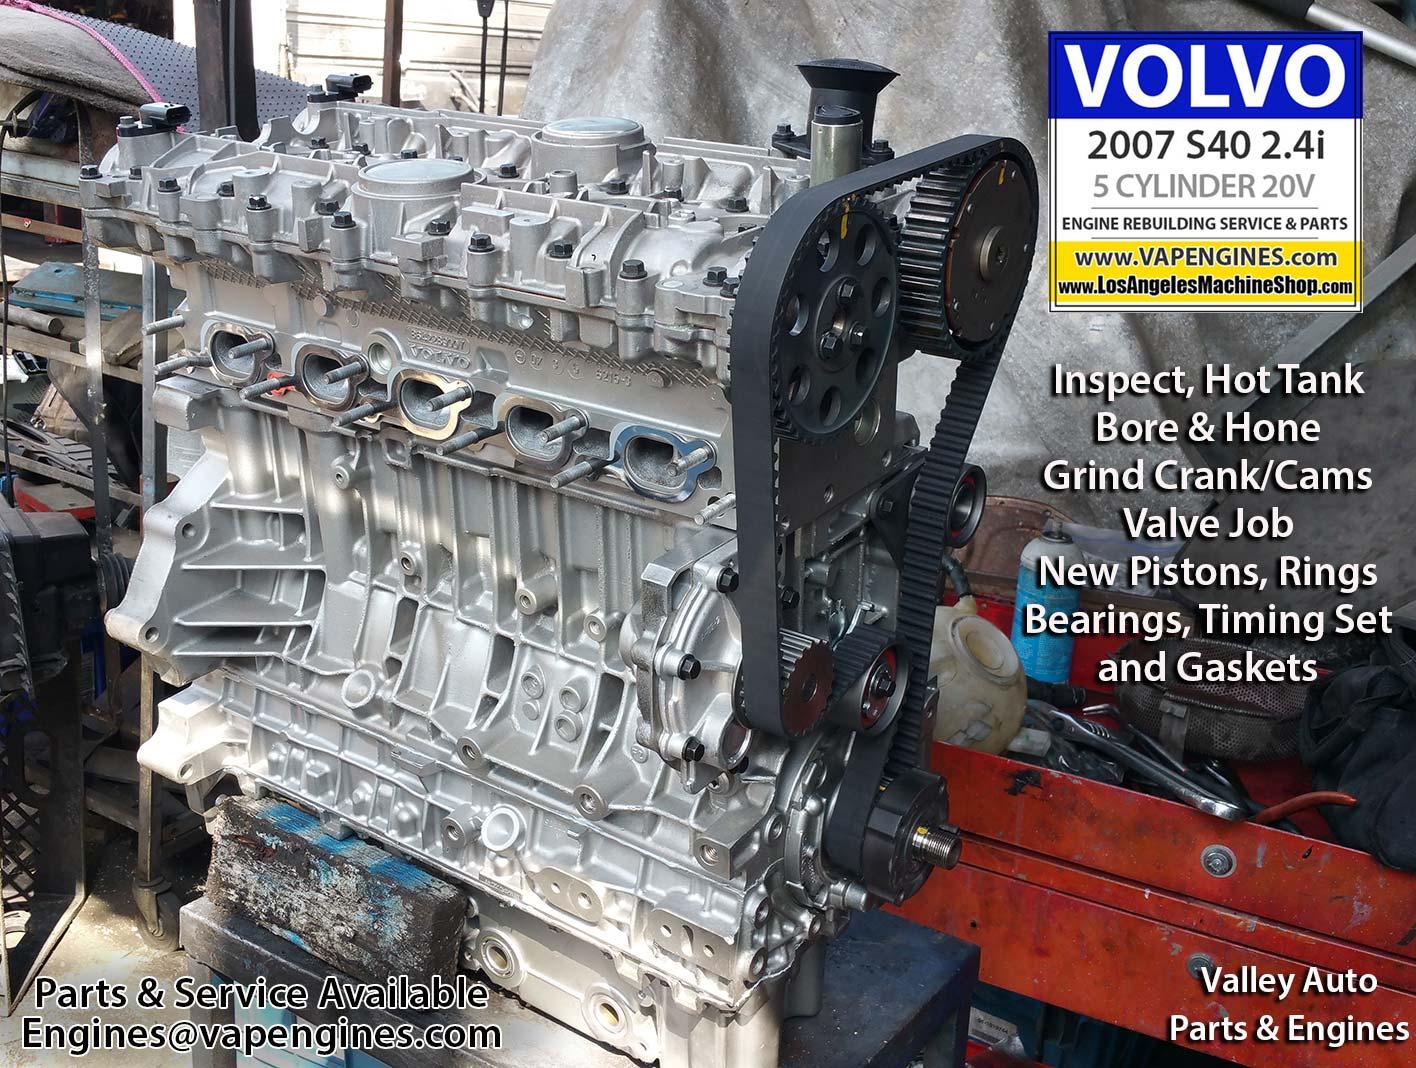 07 Volvo S40 2.4i Engine Rebuild - Los Angeles Machine Shop- Engine  Rebuilder Auto Parts Store   Volvo S40 2 4i Engine Diagram      Los Angeles Machine Shop